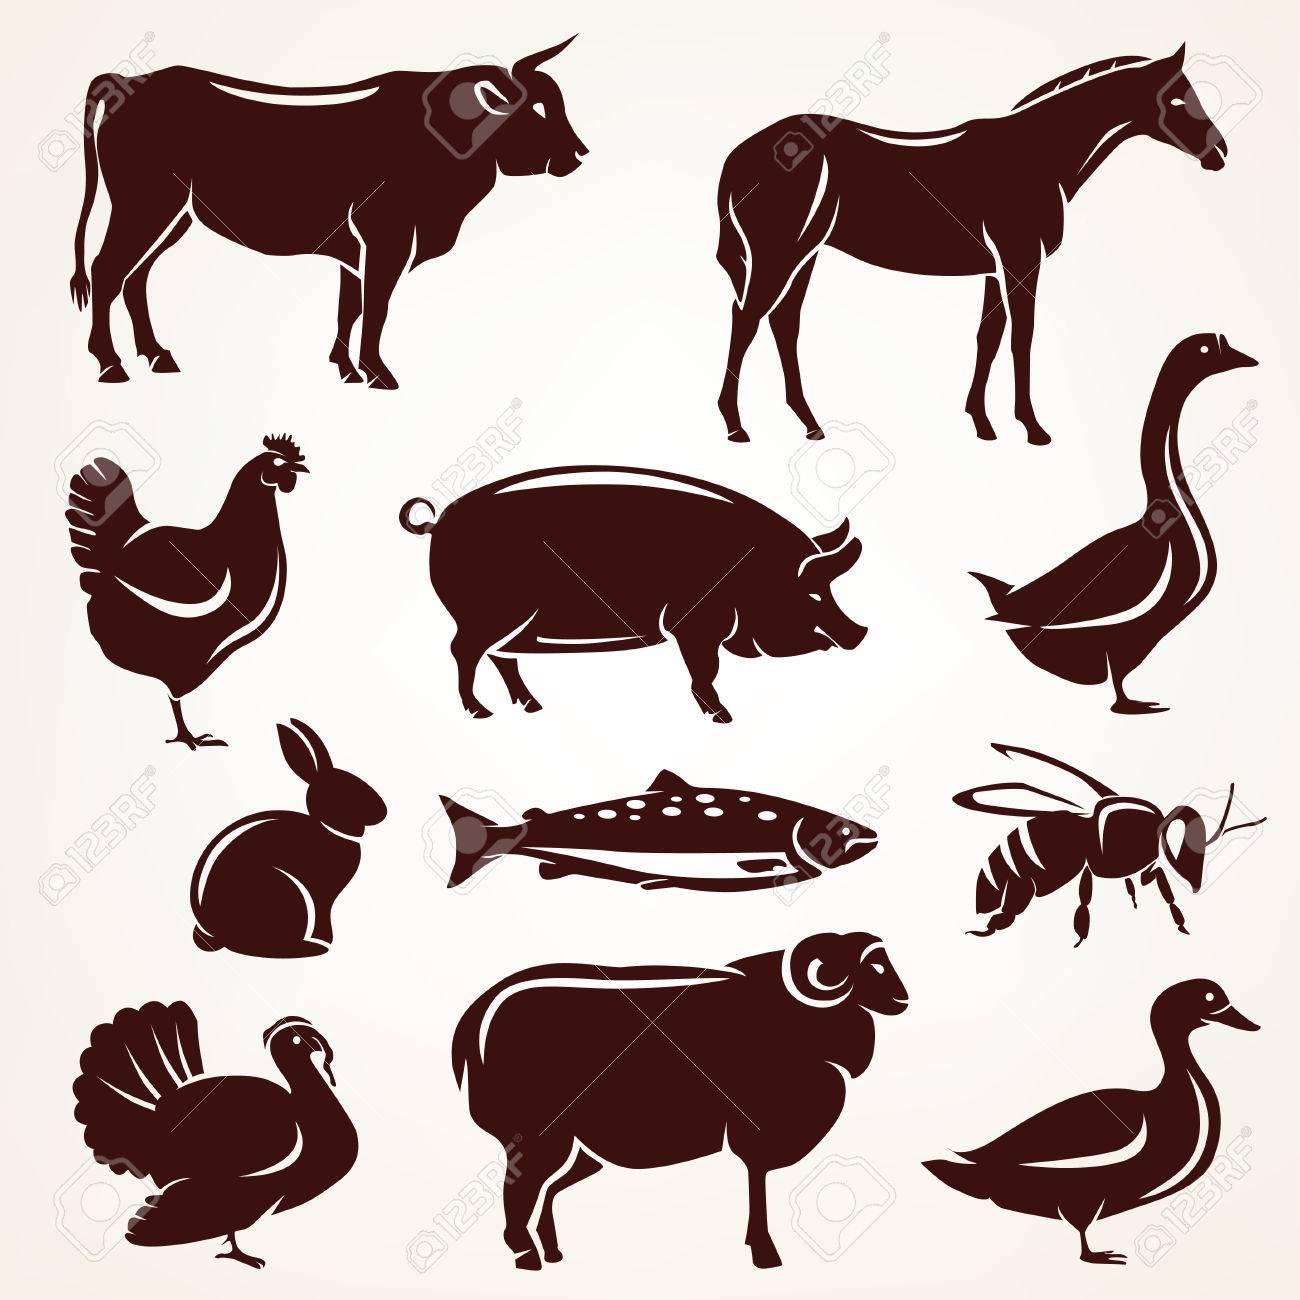 farm animals silhouette collection Stock Vector - 49211835